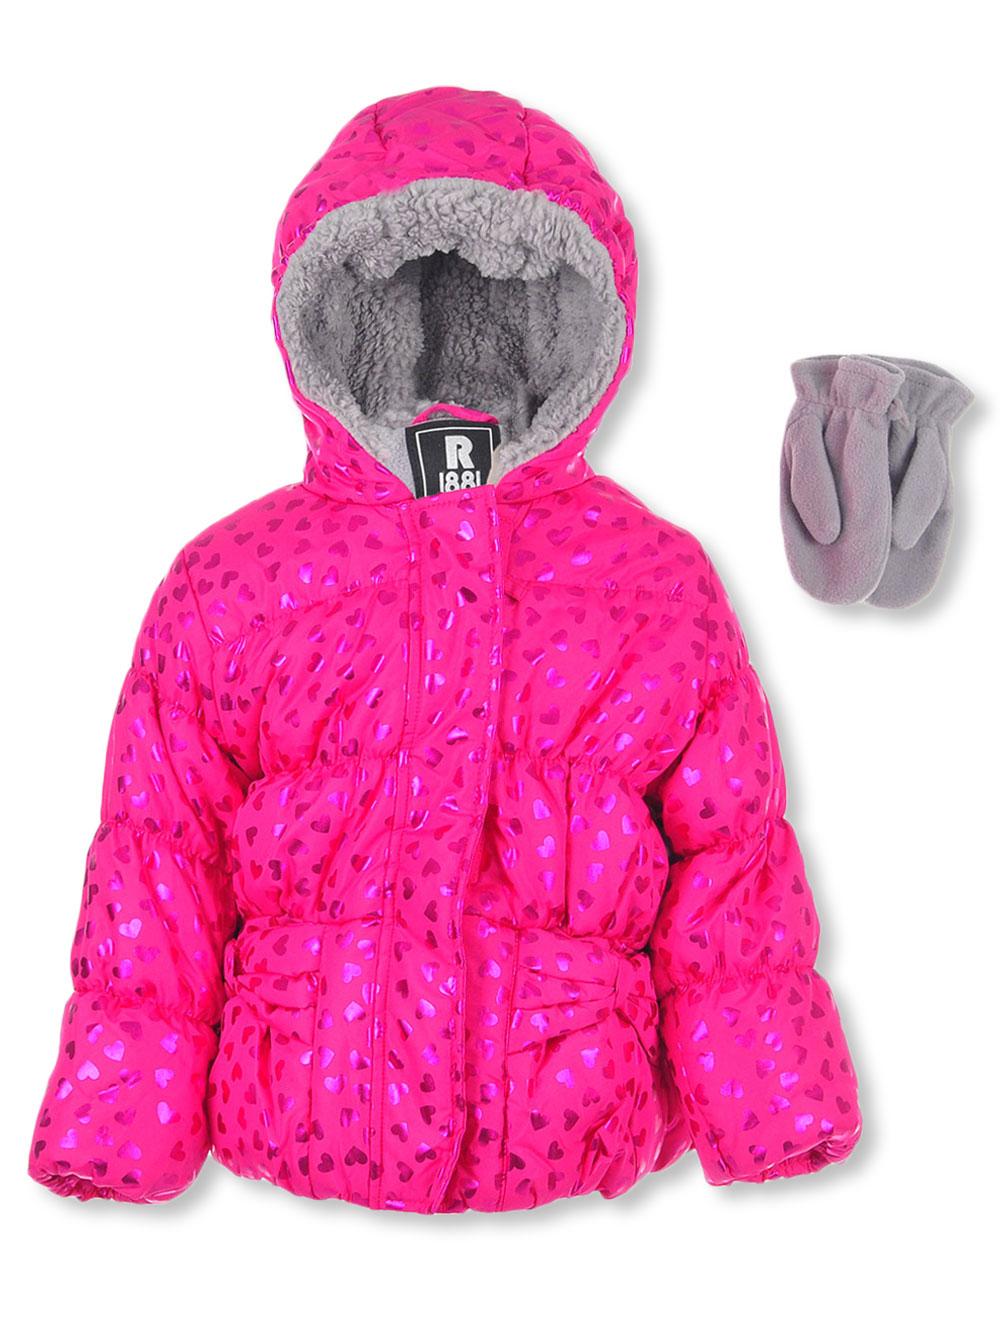 9c912c743 Rothschild Baby Girls' Insulated Jacket with Mittens